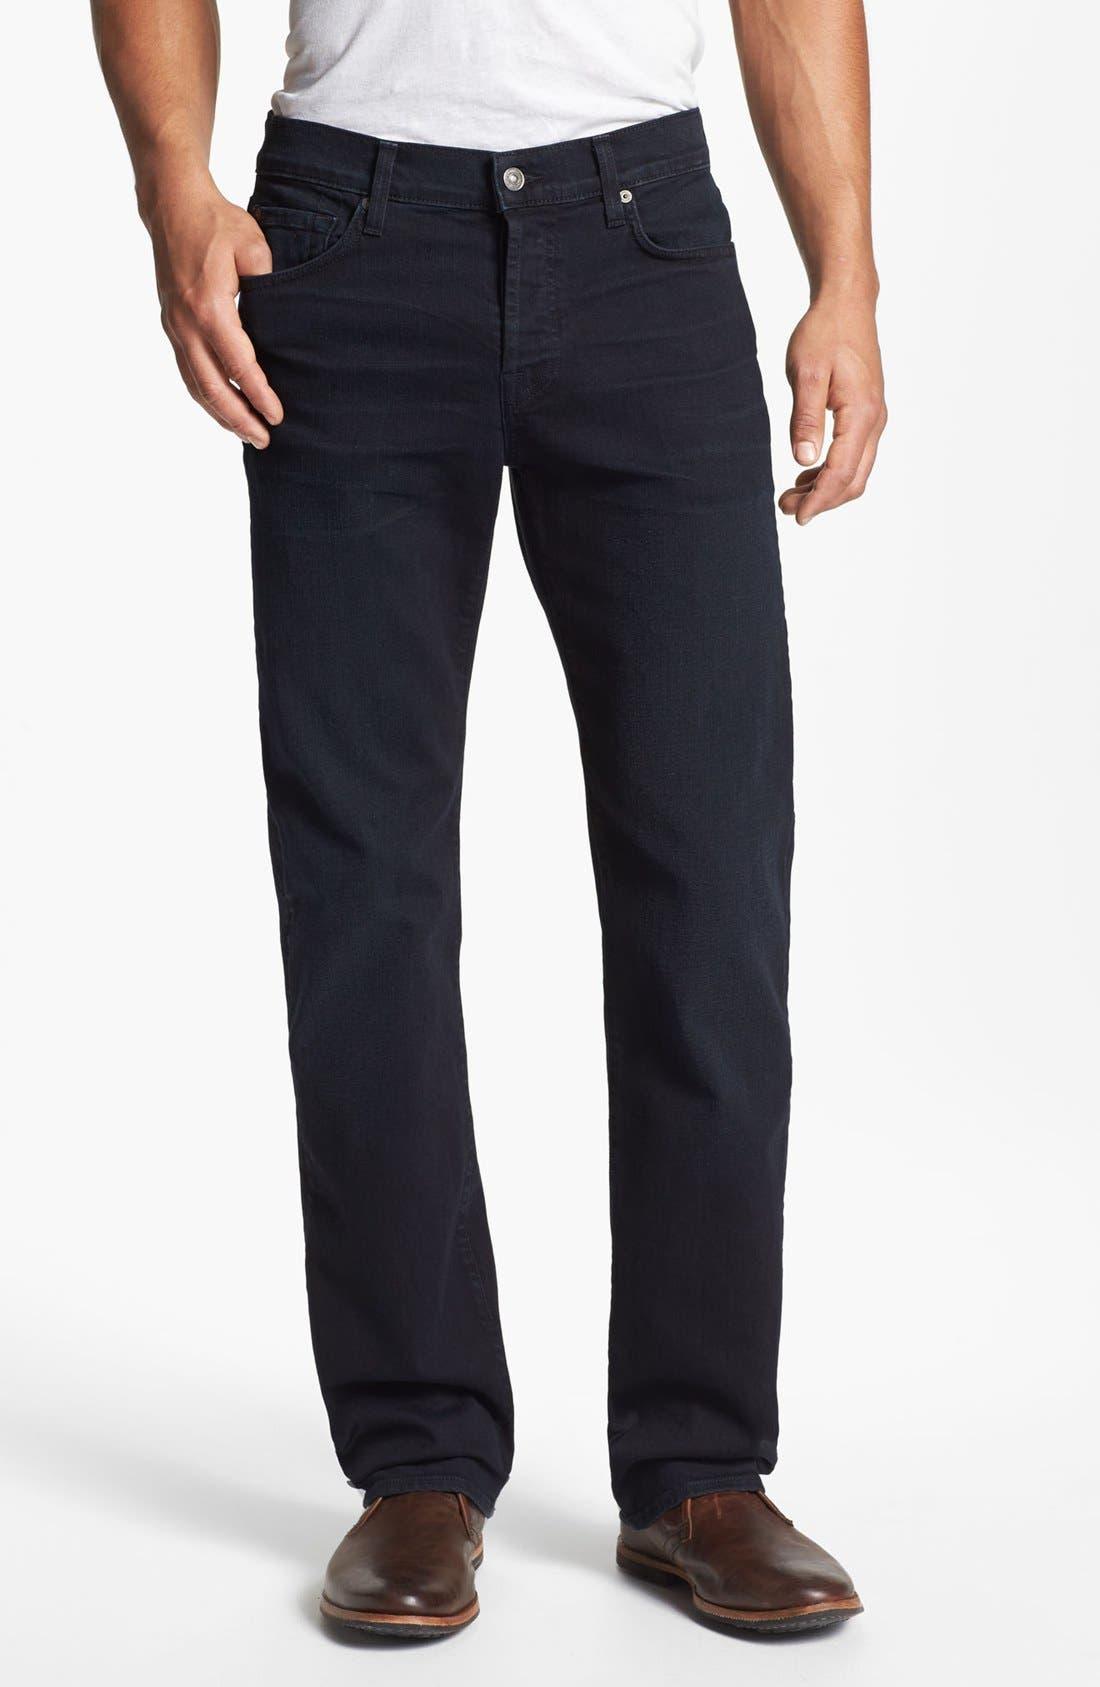 Alternate Image 2  - 7 For All Mankind® 'Standard' Straight Leg Jeans (Castaic Lake)